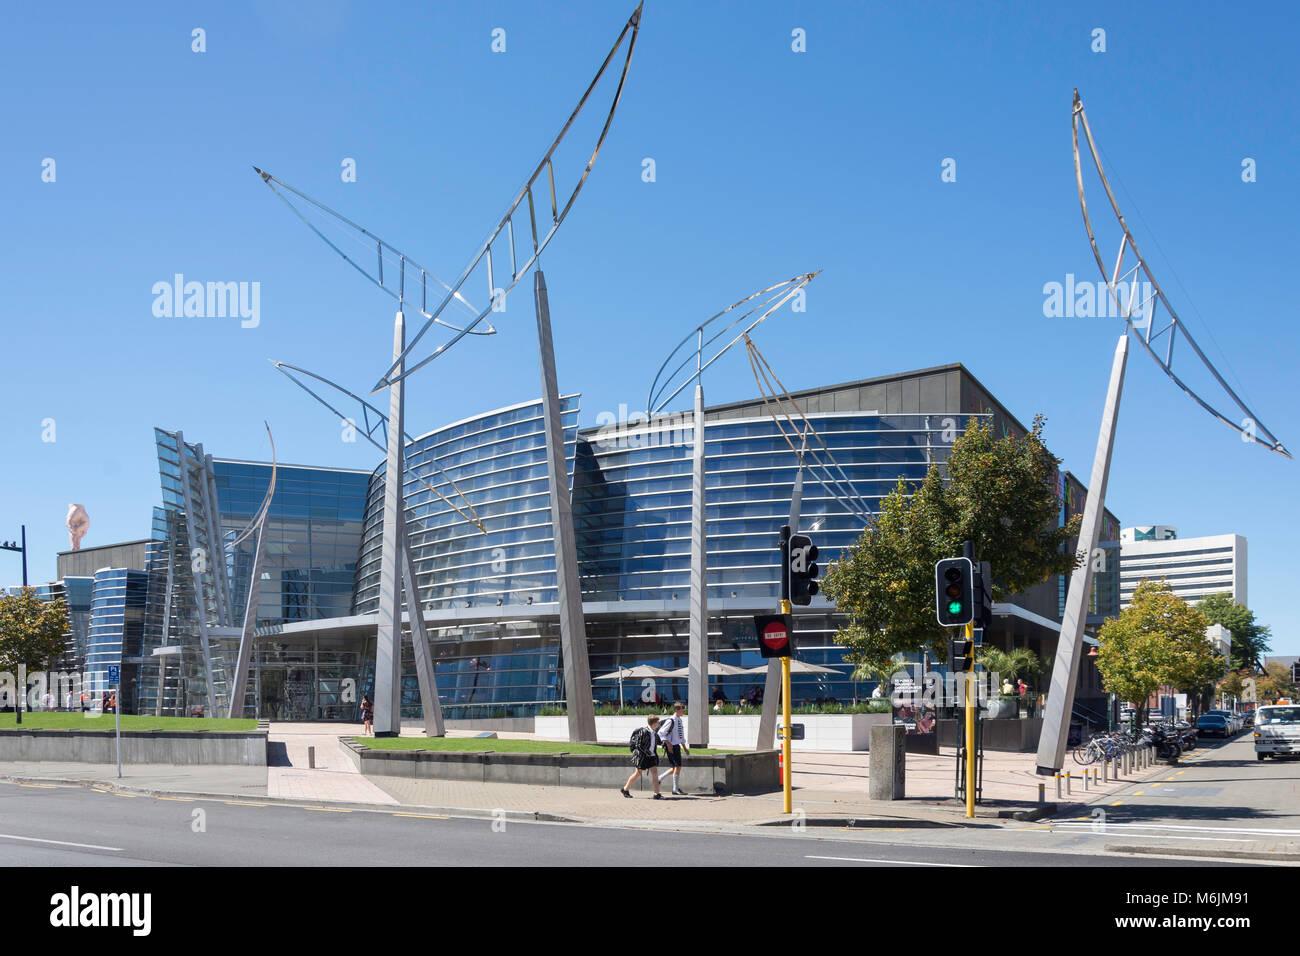 Video Christchurch Gallery: Polynesian Architecture Stock Photos & Polynesian